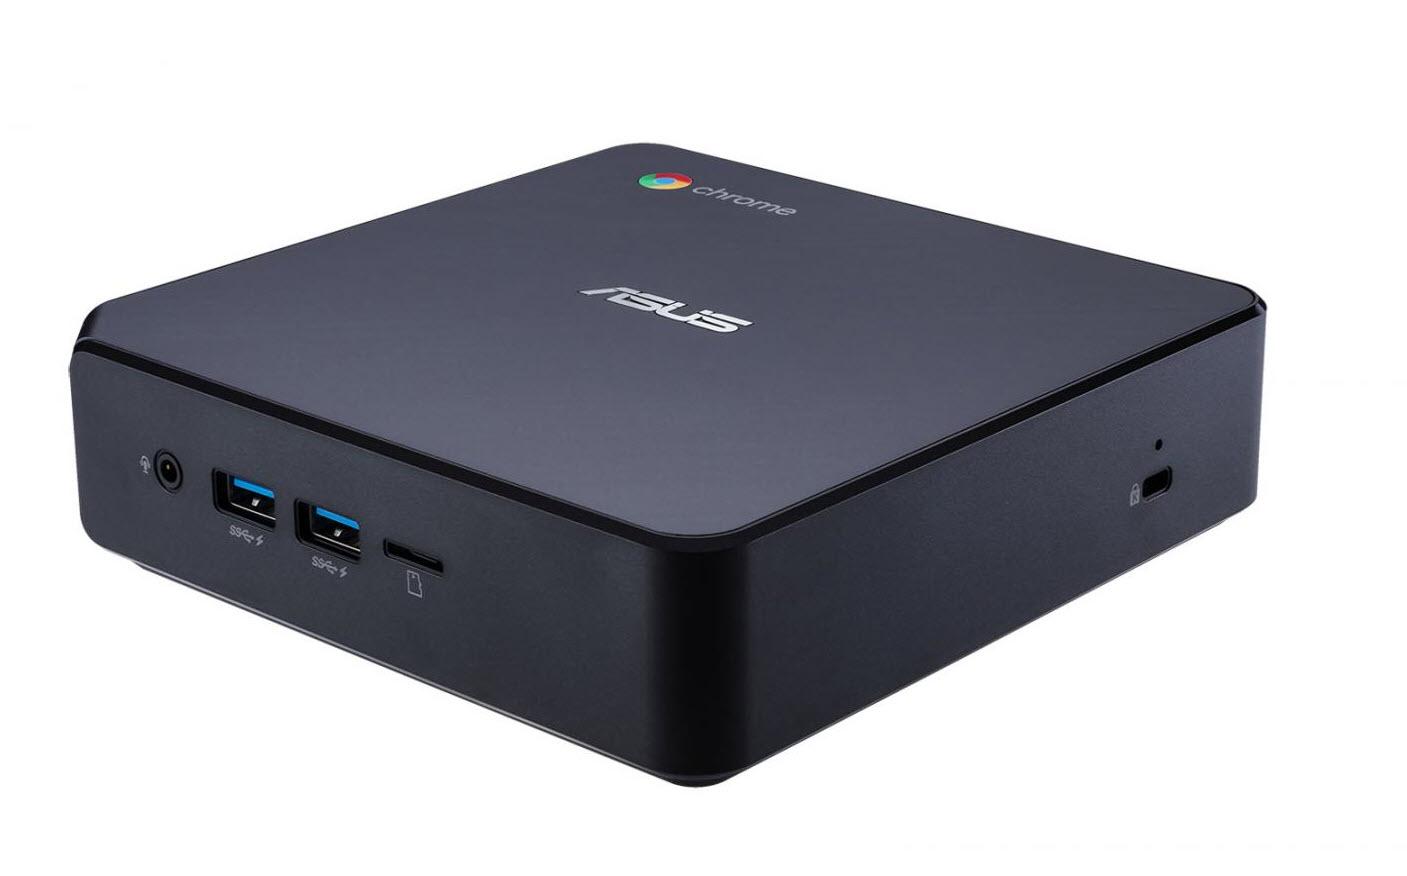 2018 05 27 8 17 55 ASUS เปิดตัว ASUS Chromebox 3 ซีรี่ย์ mini PC รุ่นใหม่ล่าสุด